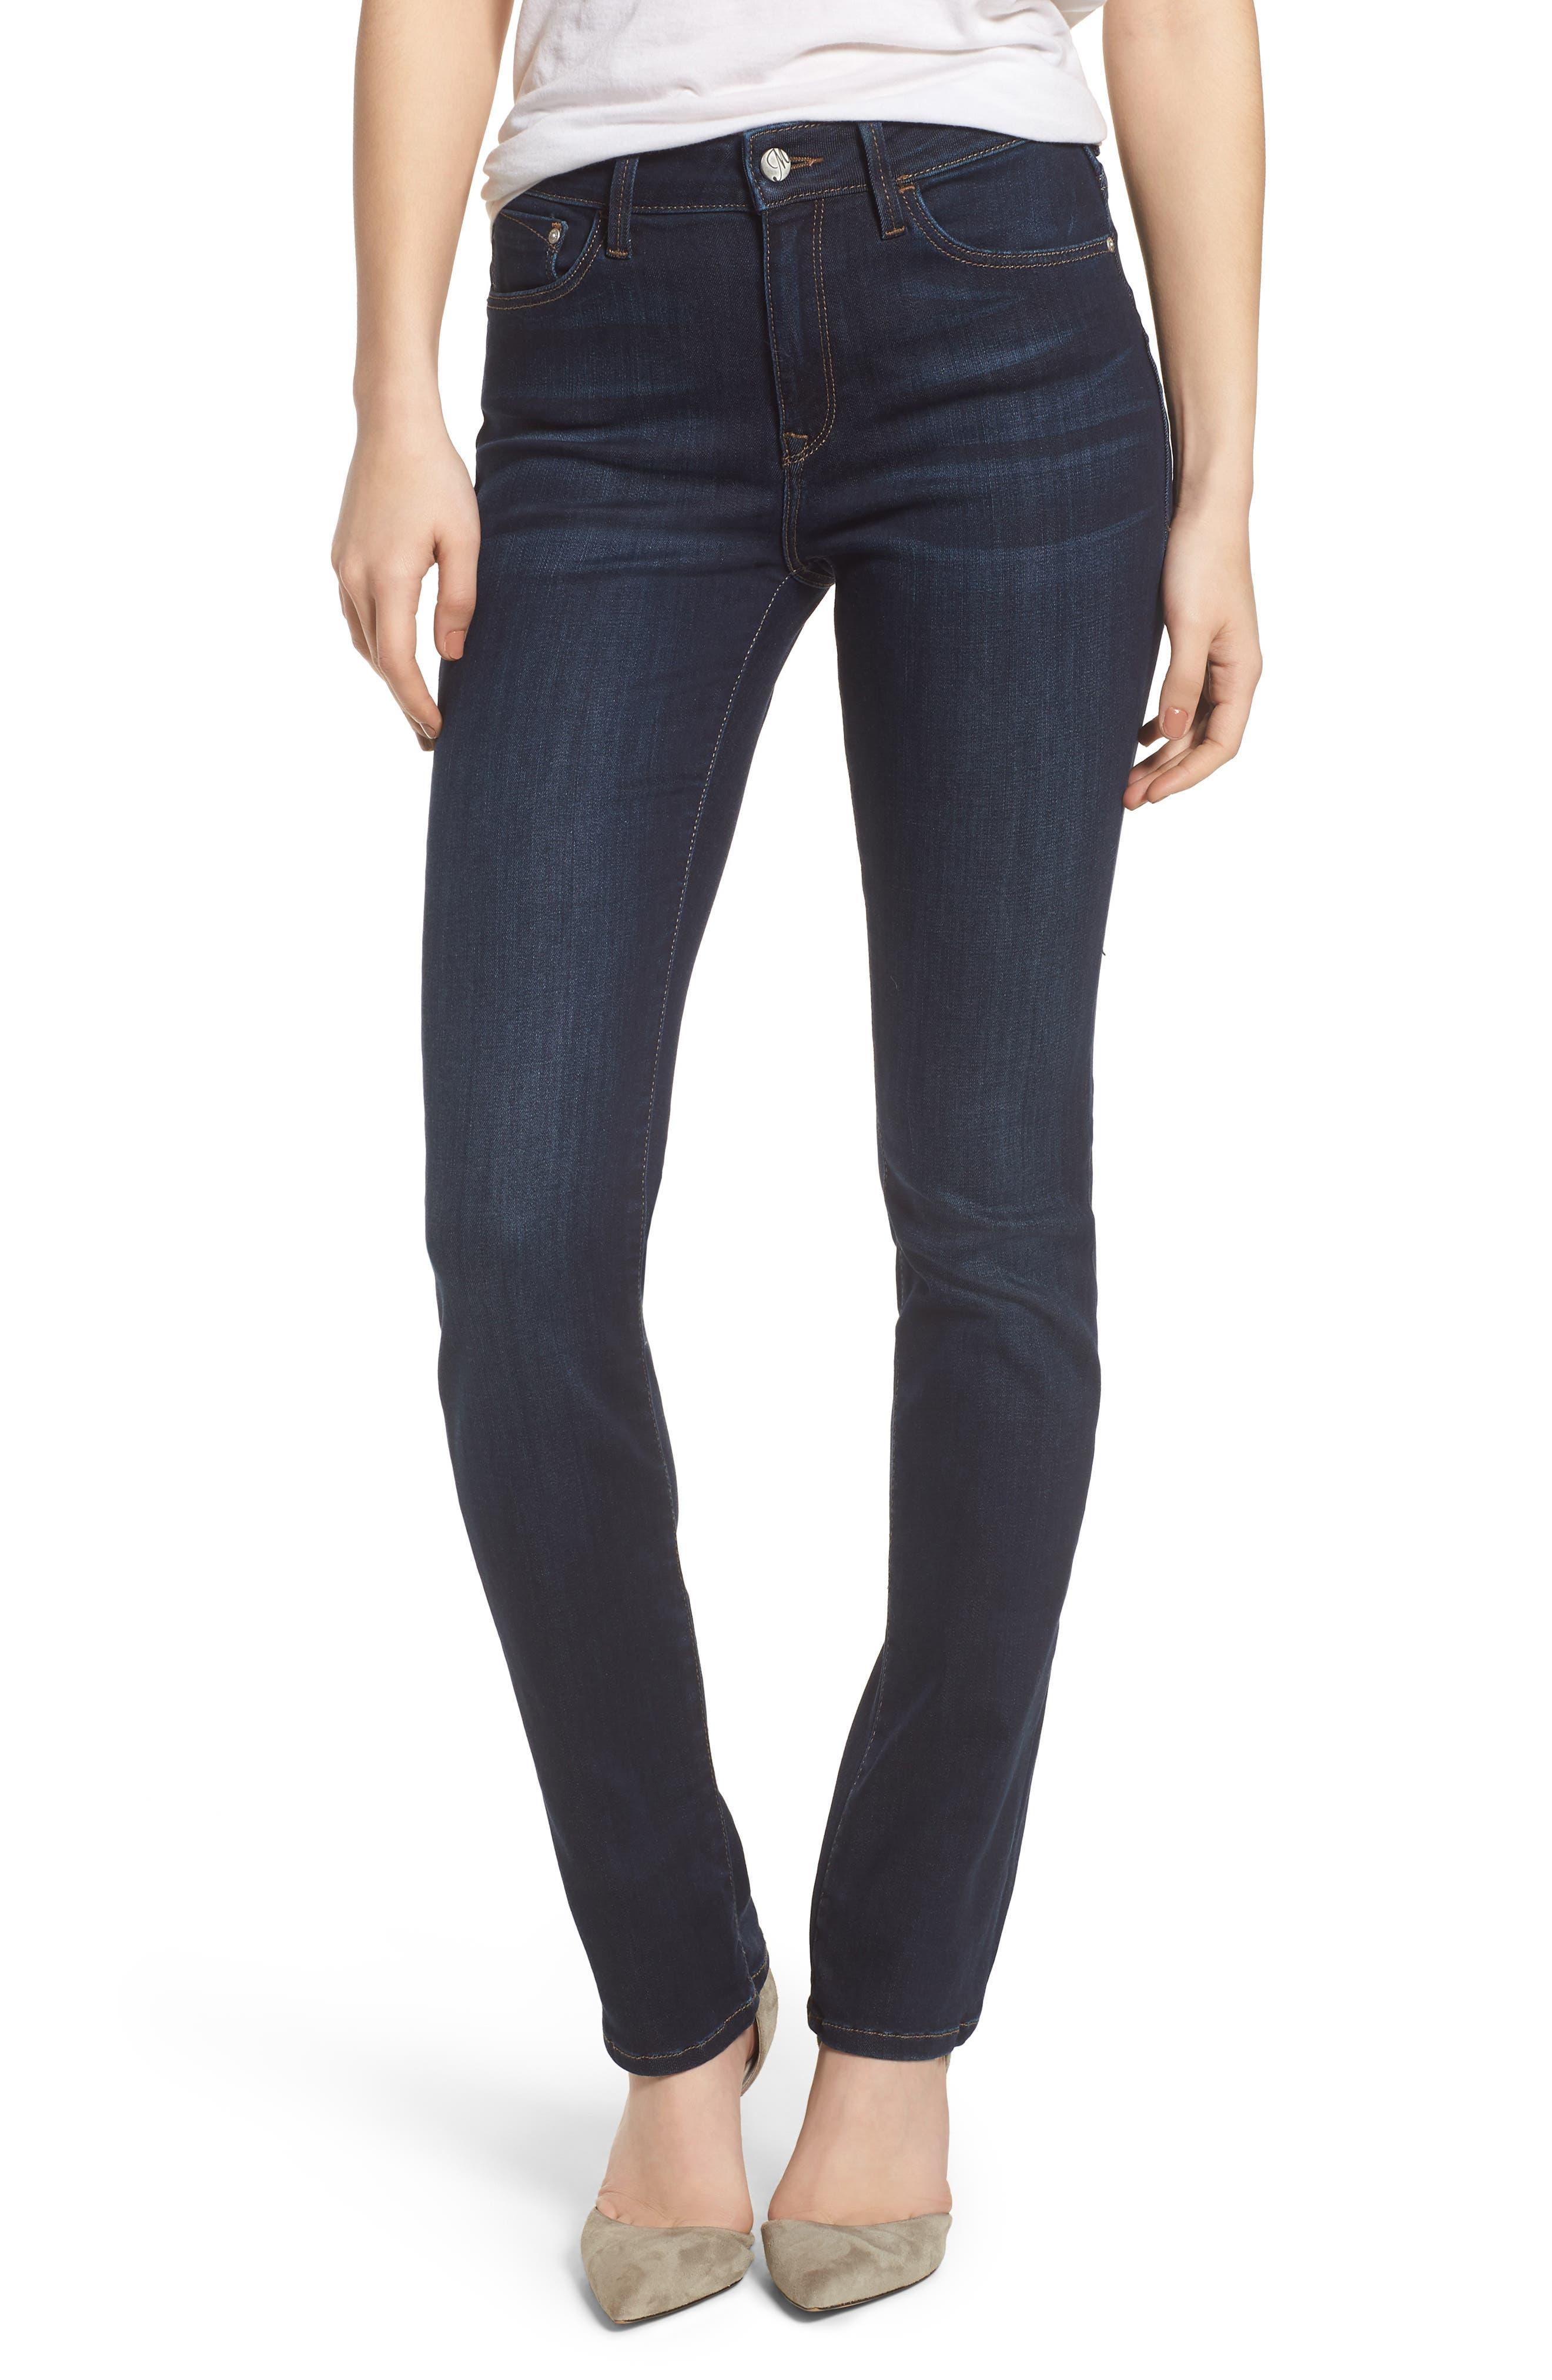 Kendra Straight Leg Jeans,                             Main thumbnail 1, color,                             Deep Supersoft